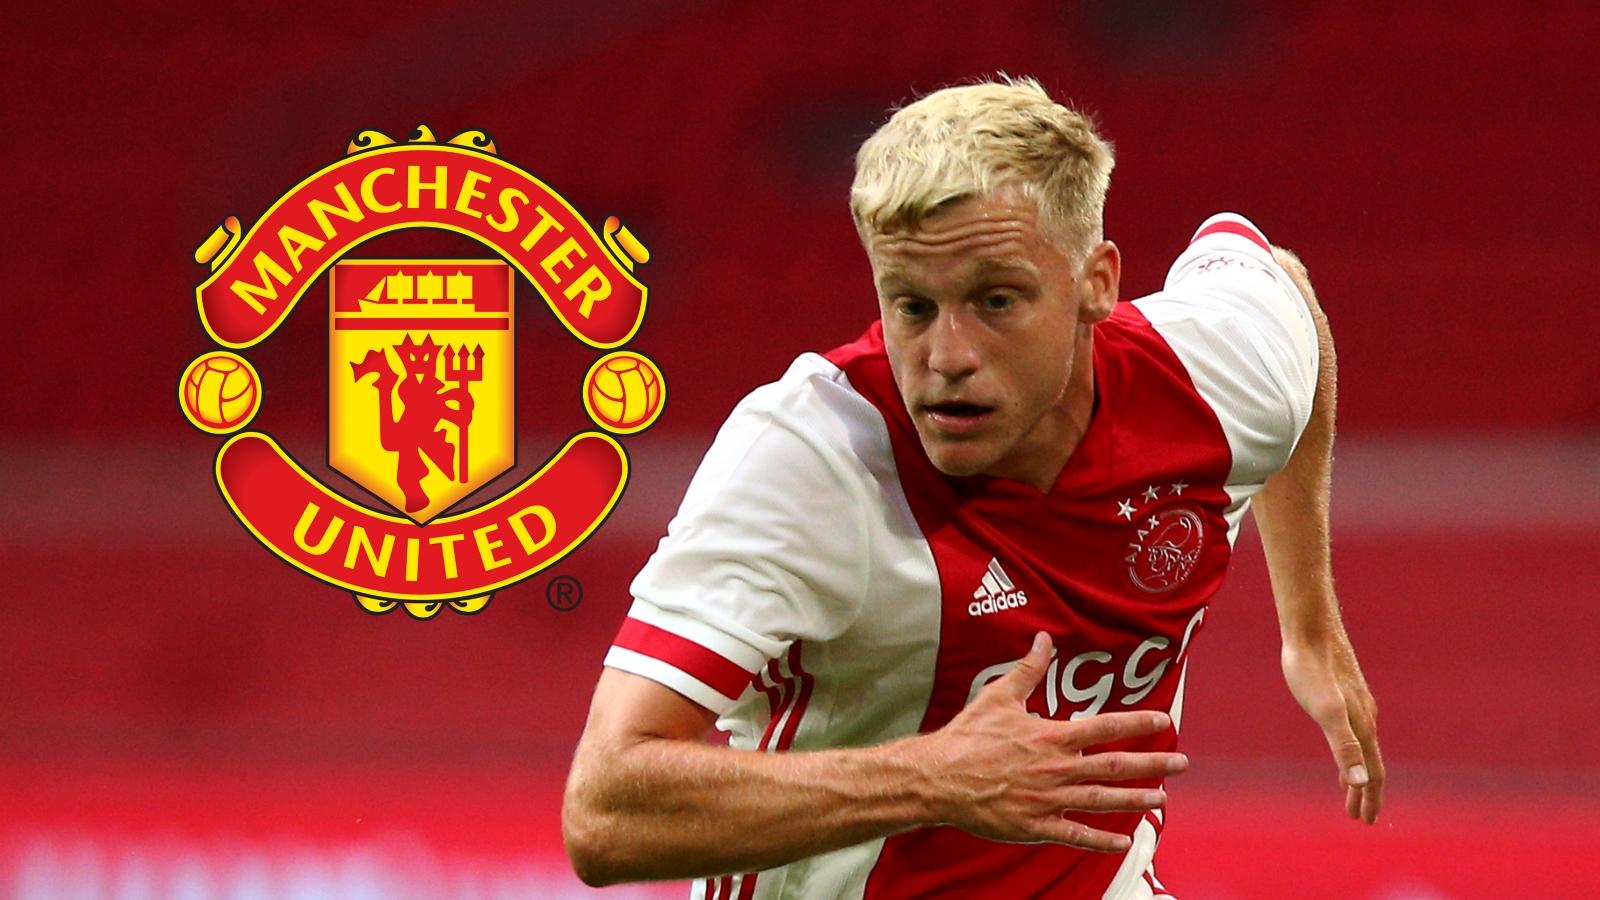 'Van de Beek is a fantastic signing!' - Ex-Ajax star will bring 'flexibility' to Man Utd's midfield, says Fletcher